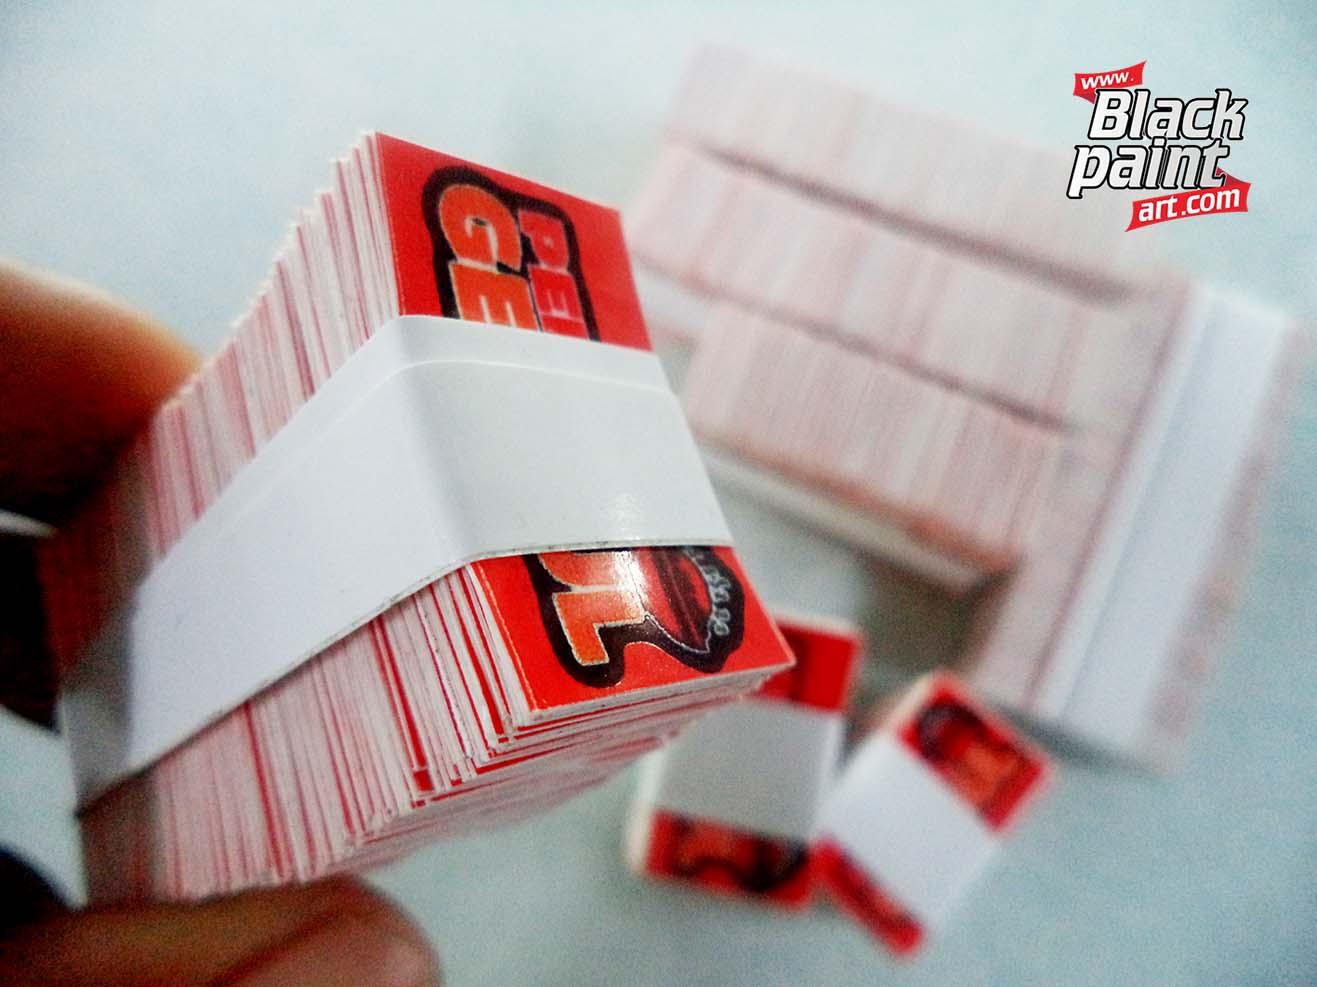 379 cetak stiker di pekanbaru.jpg